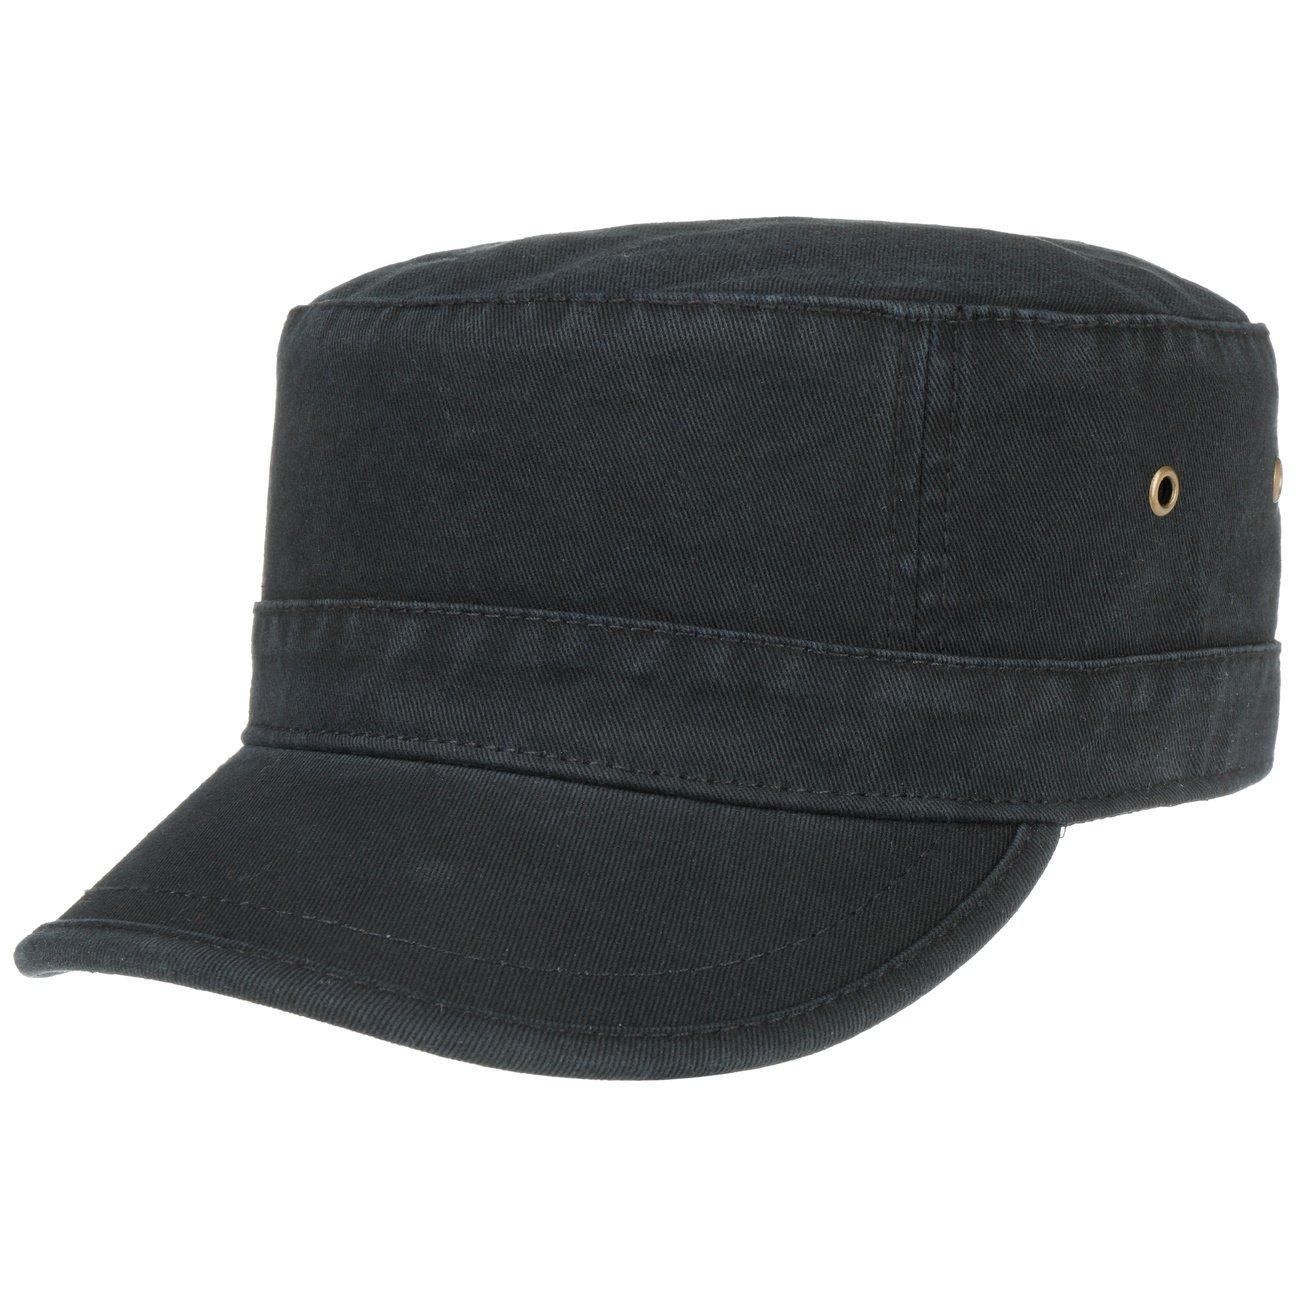 Urban Army Cap for Women, EUR 12,95 --> Hats, caps ...